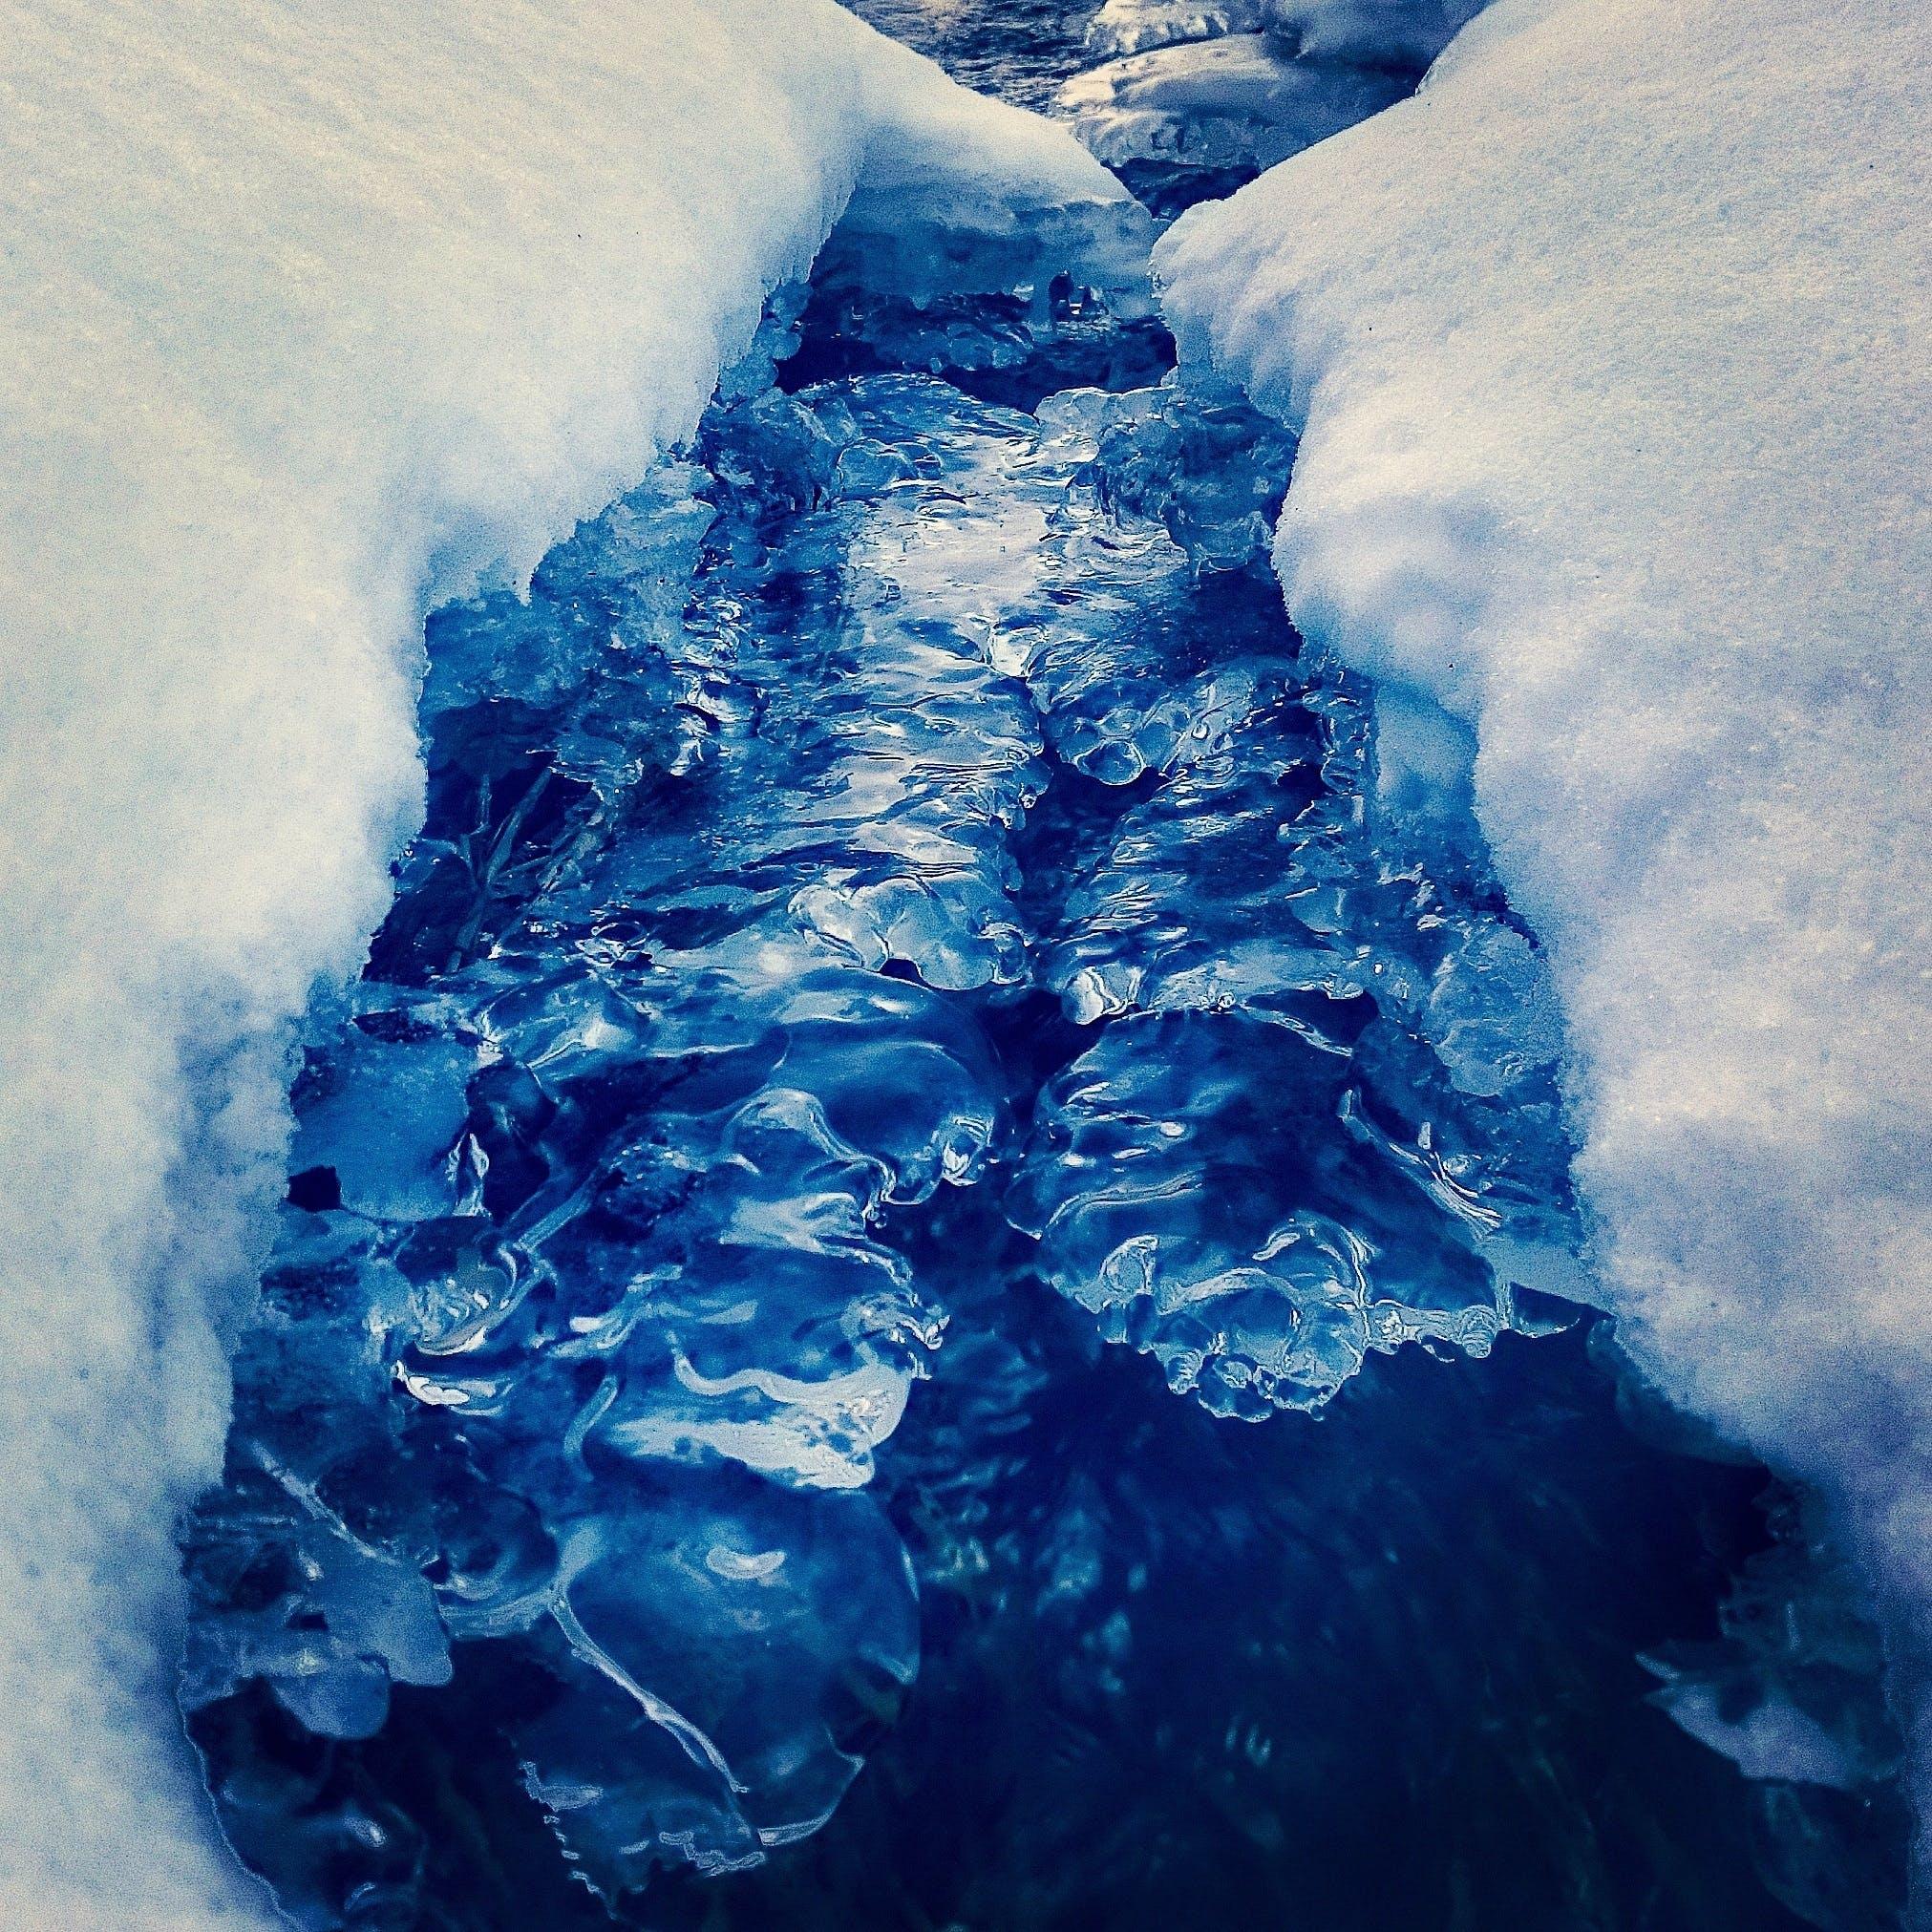 Free stock photo of cold, glacier, iceberg, melting